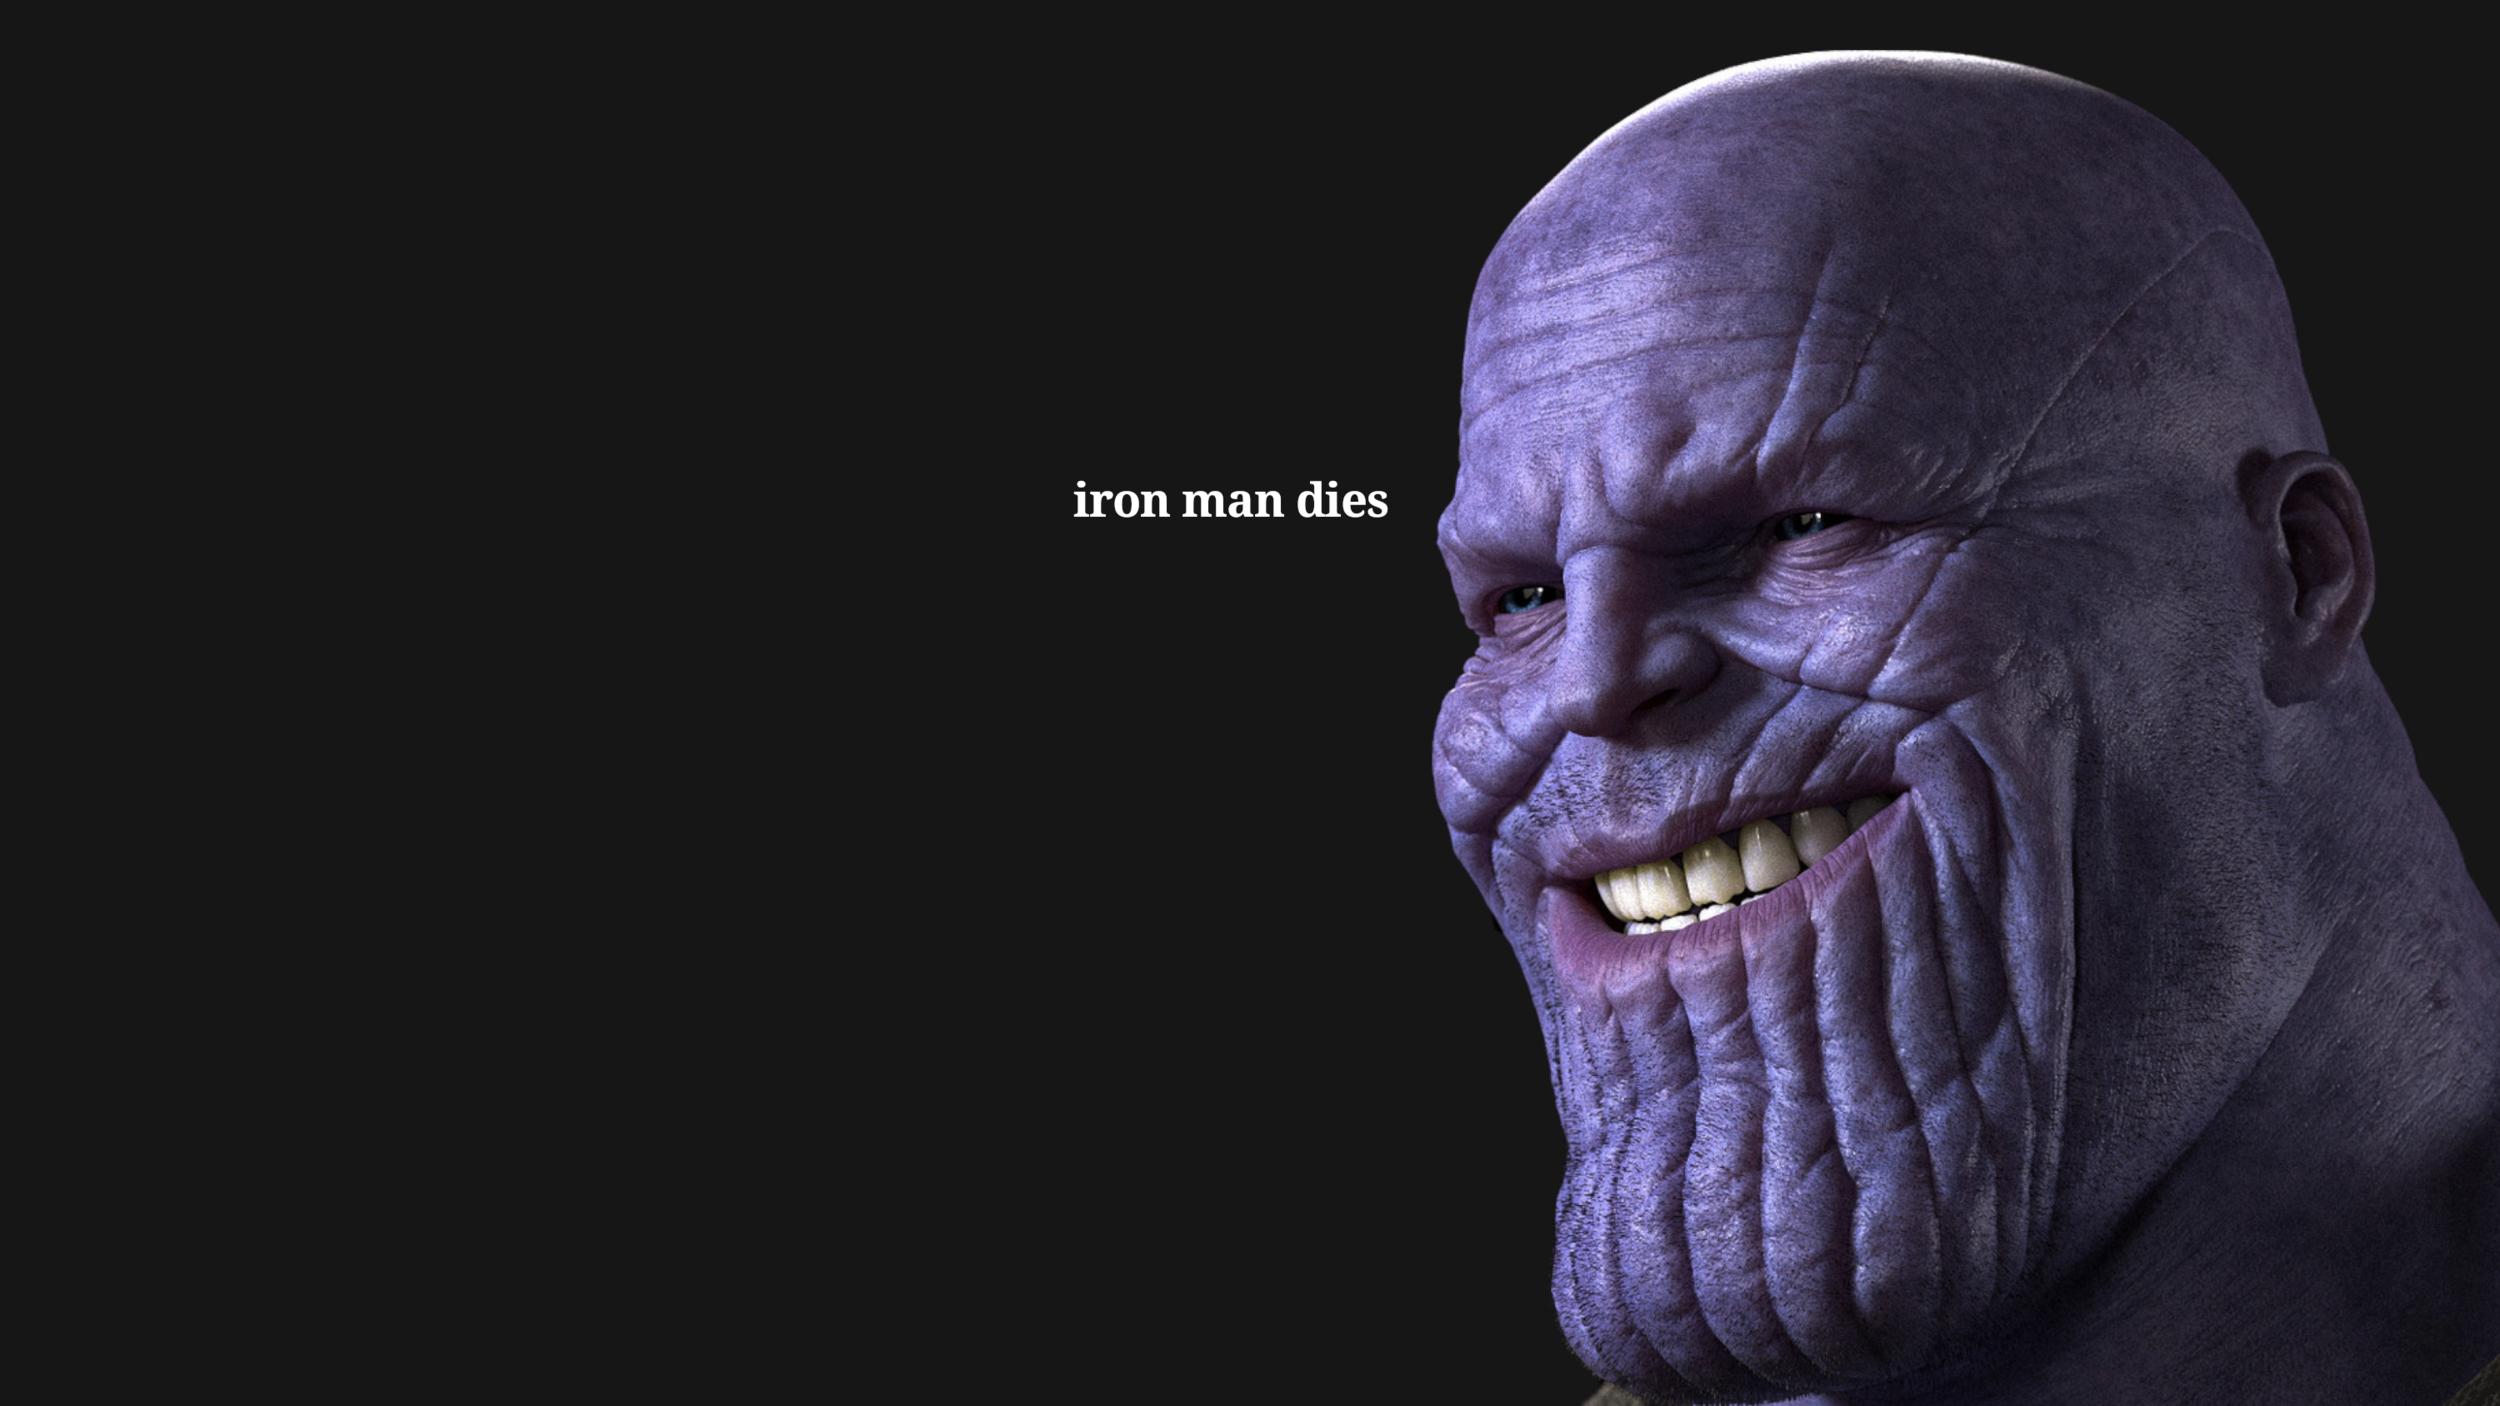 ThanosSpoailer.png